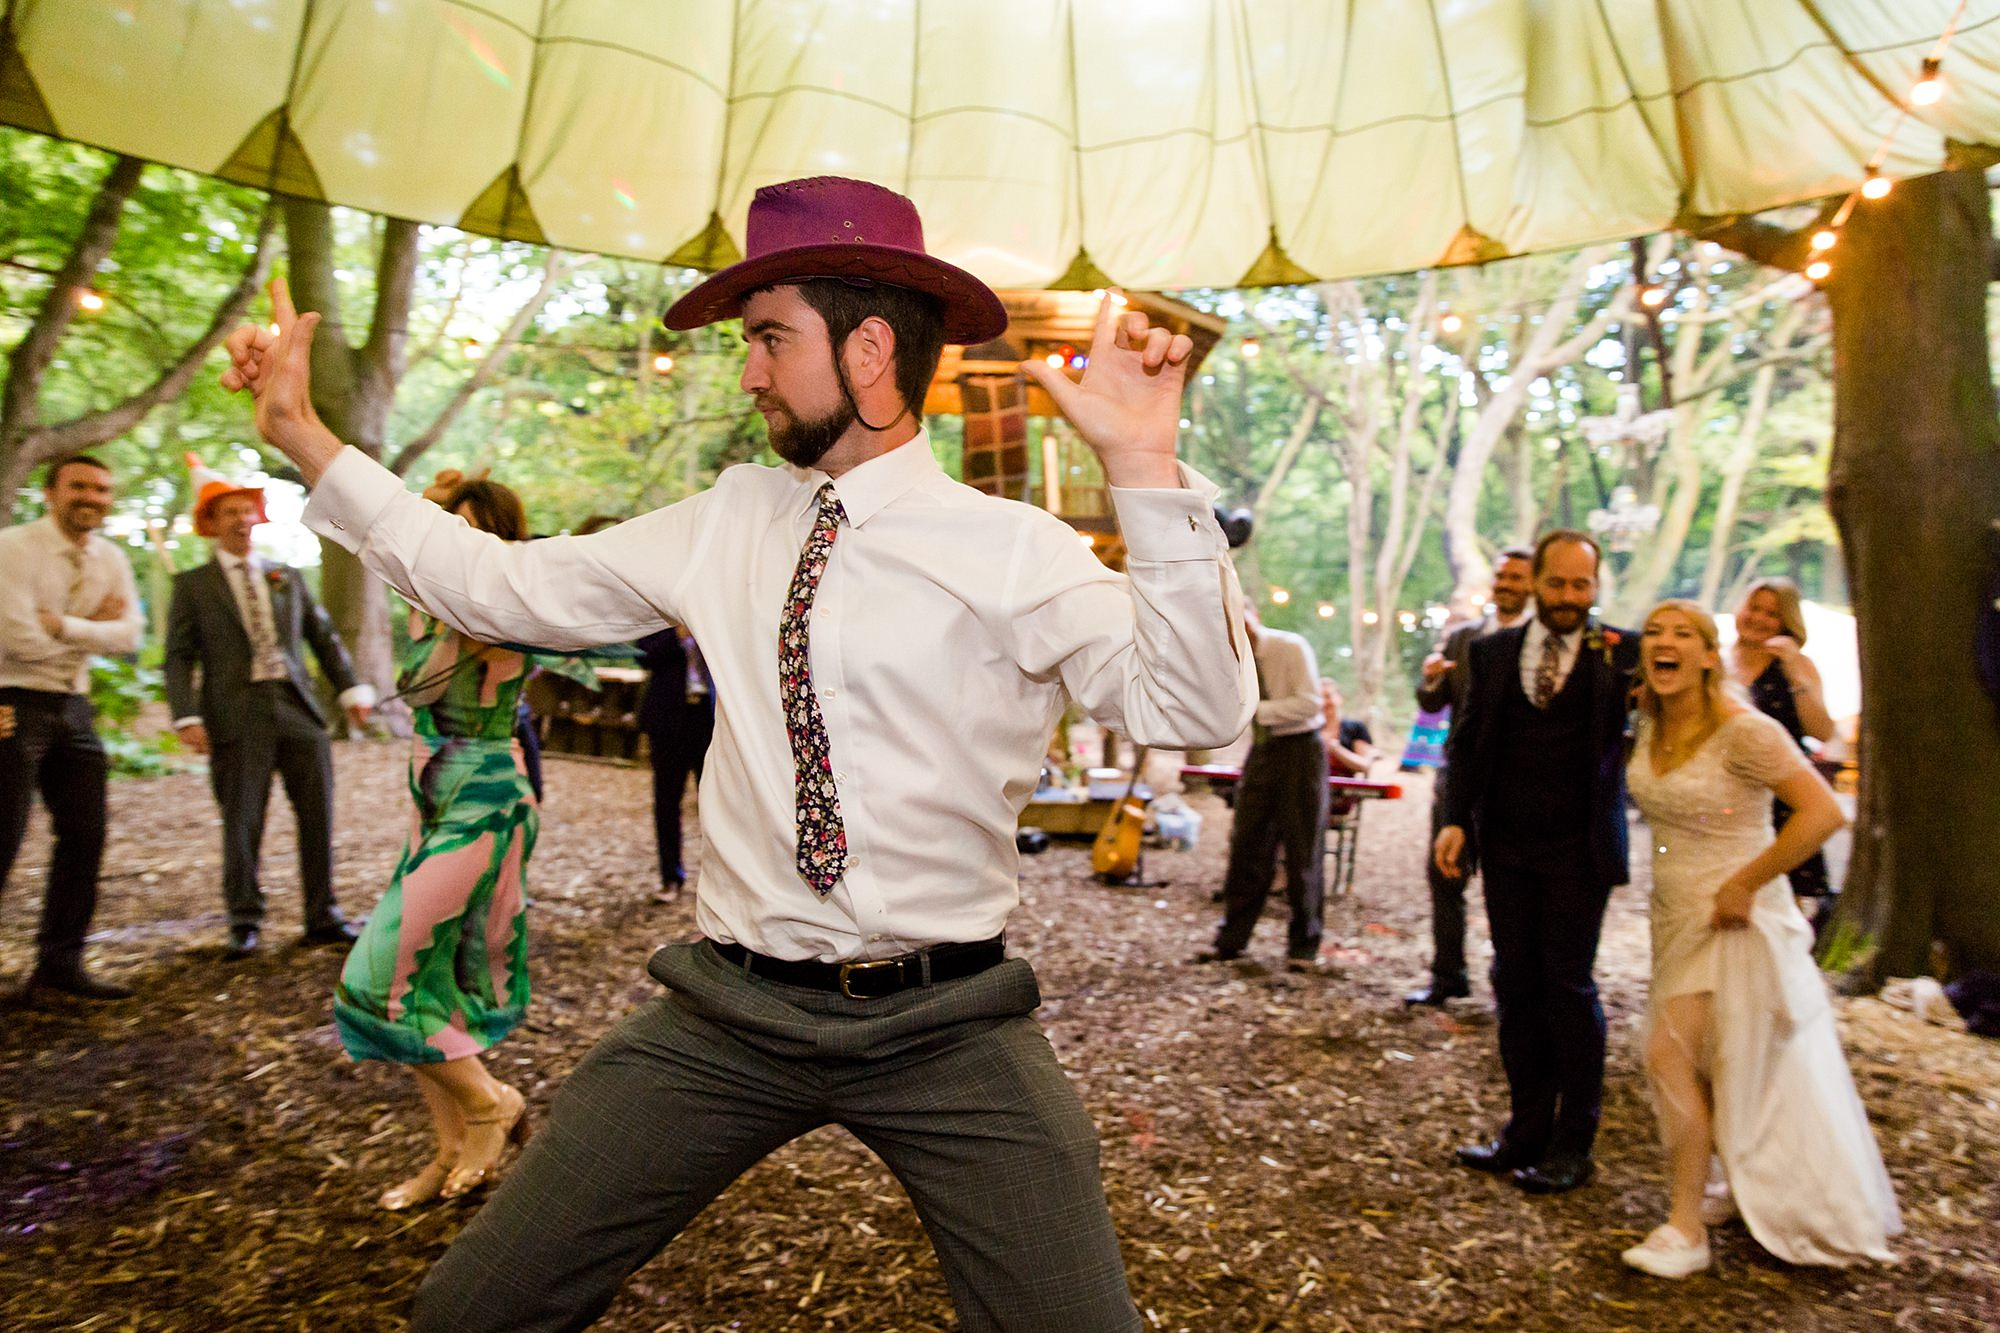 Woodland Weddings Tring fun dancing guest